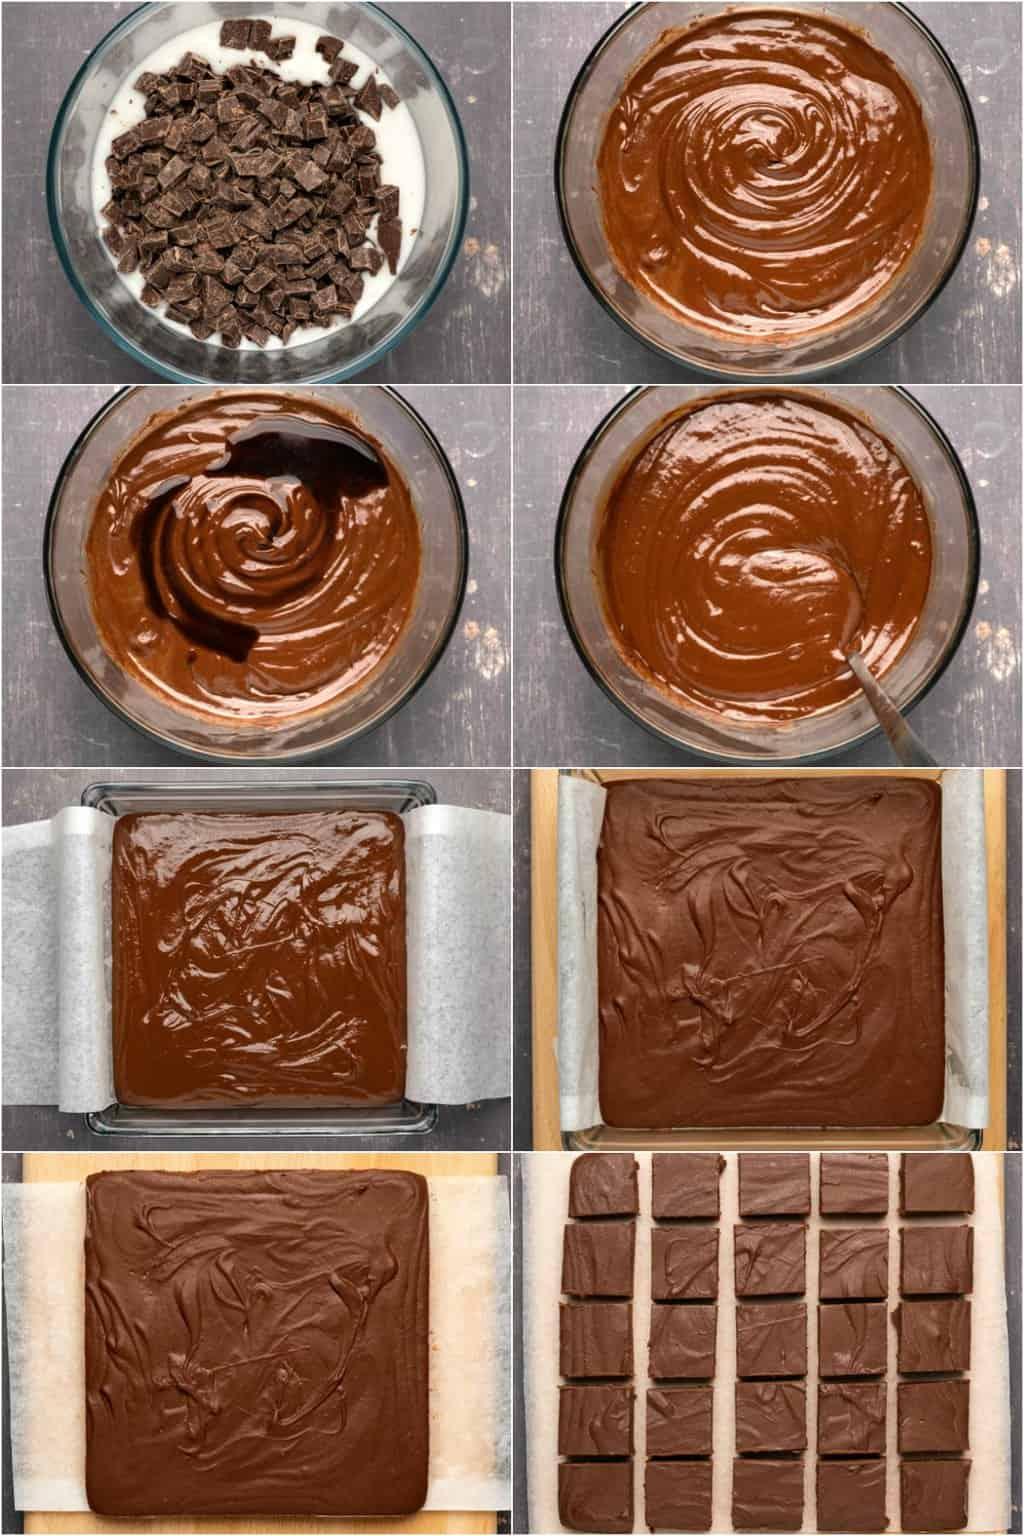 Step by step process photo collage of making 3-ingredient vegan fudge.